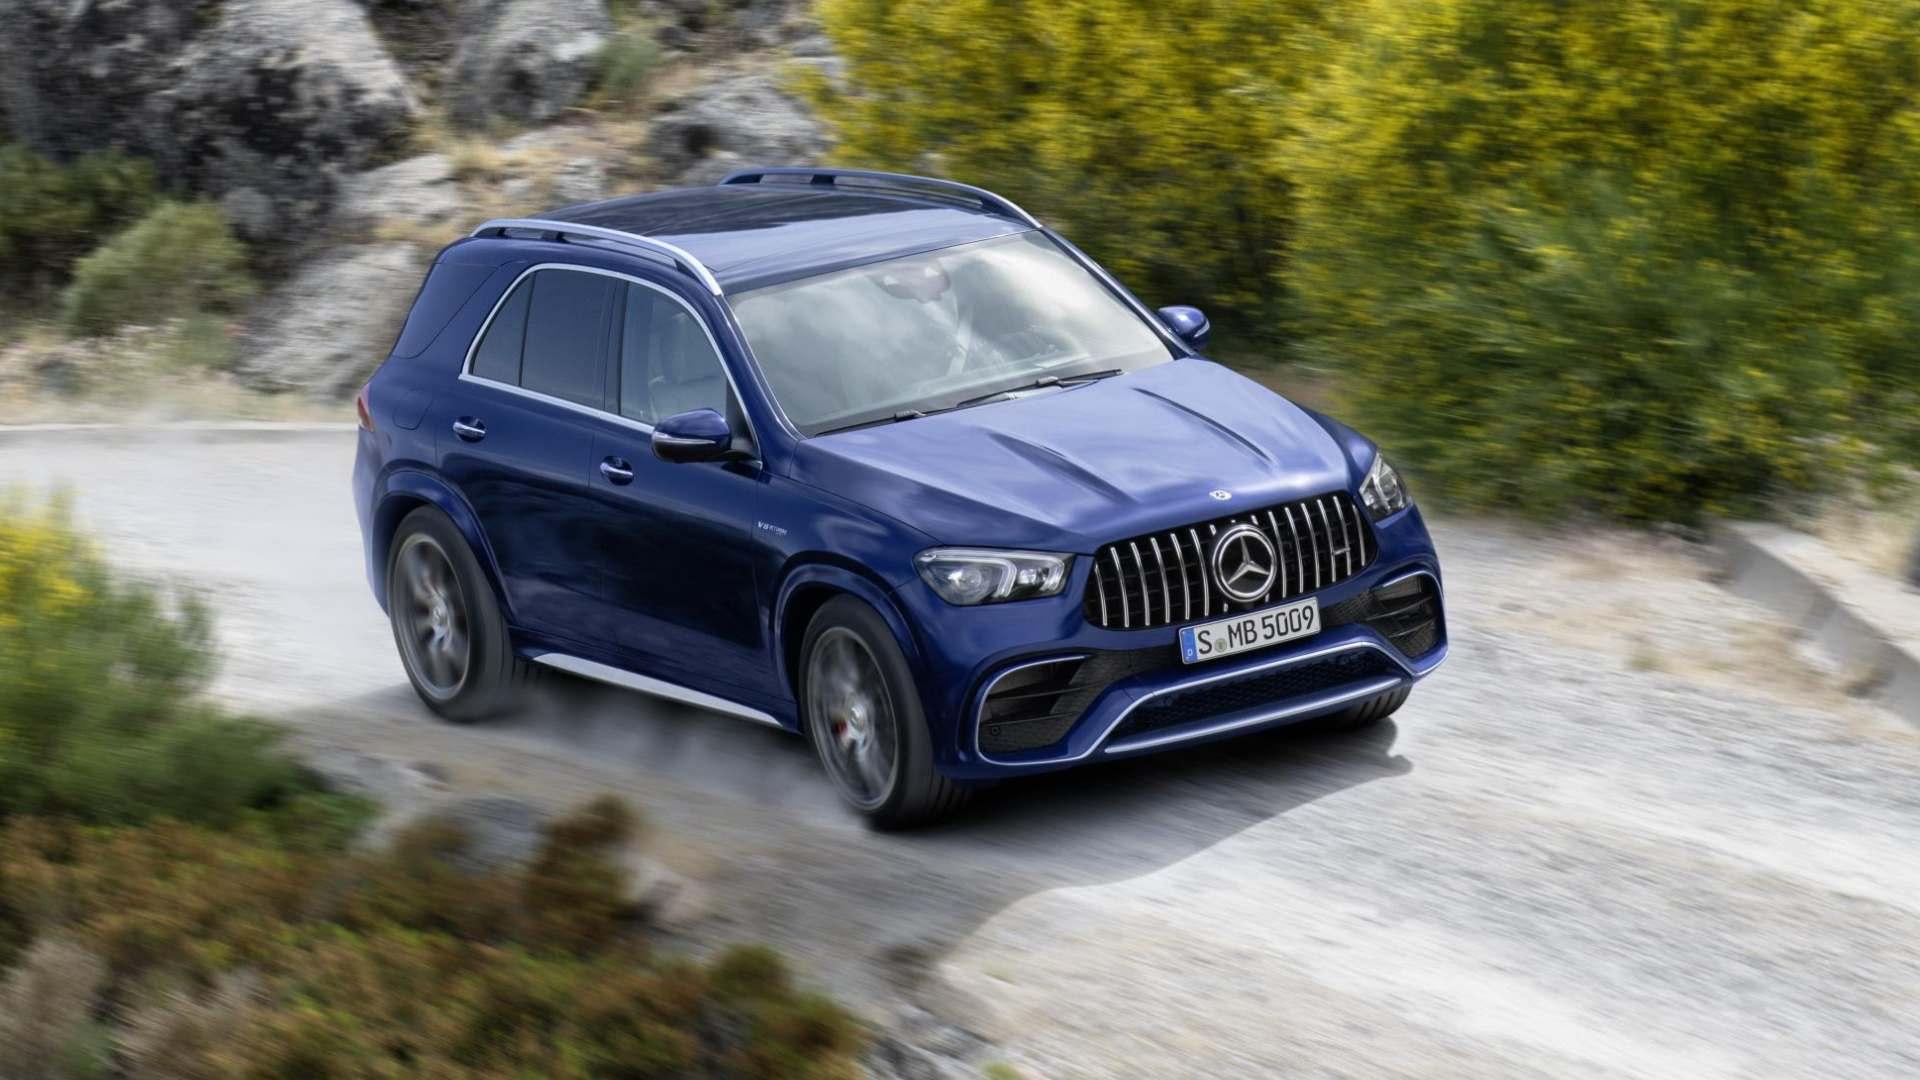 Mercedes-AMG presenta los GLE 63 4MATIC+ y GLE 63 S 4MATIC+